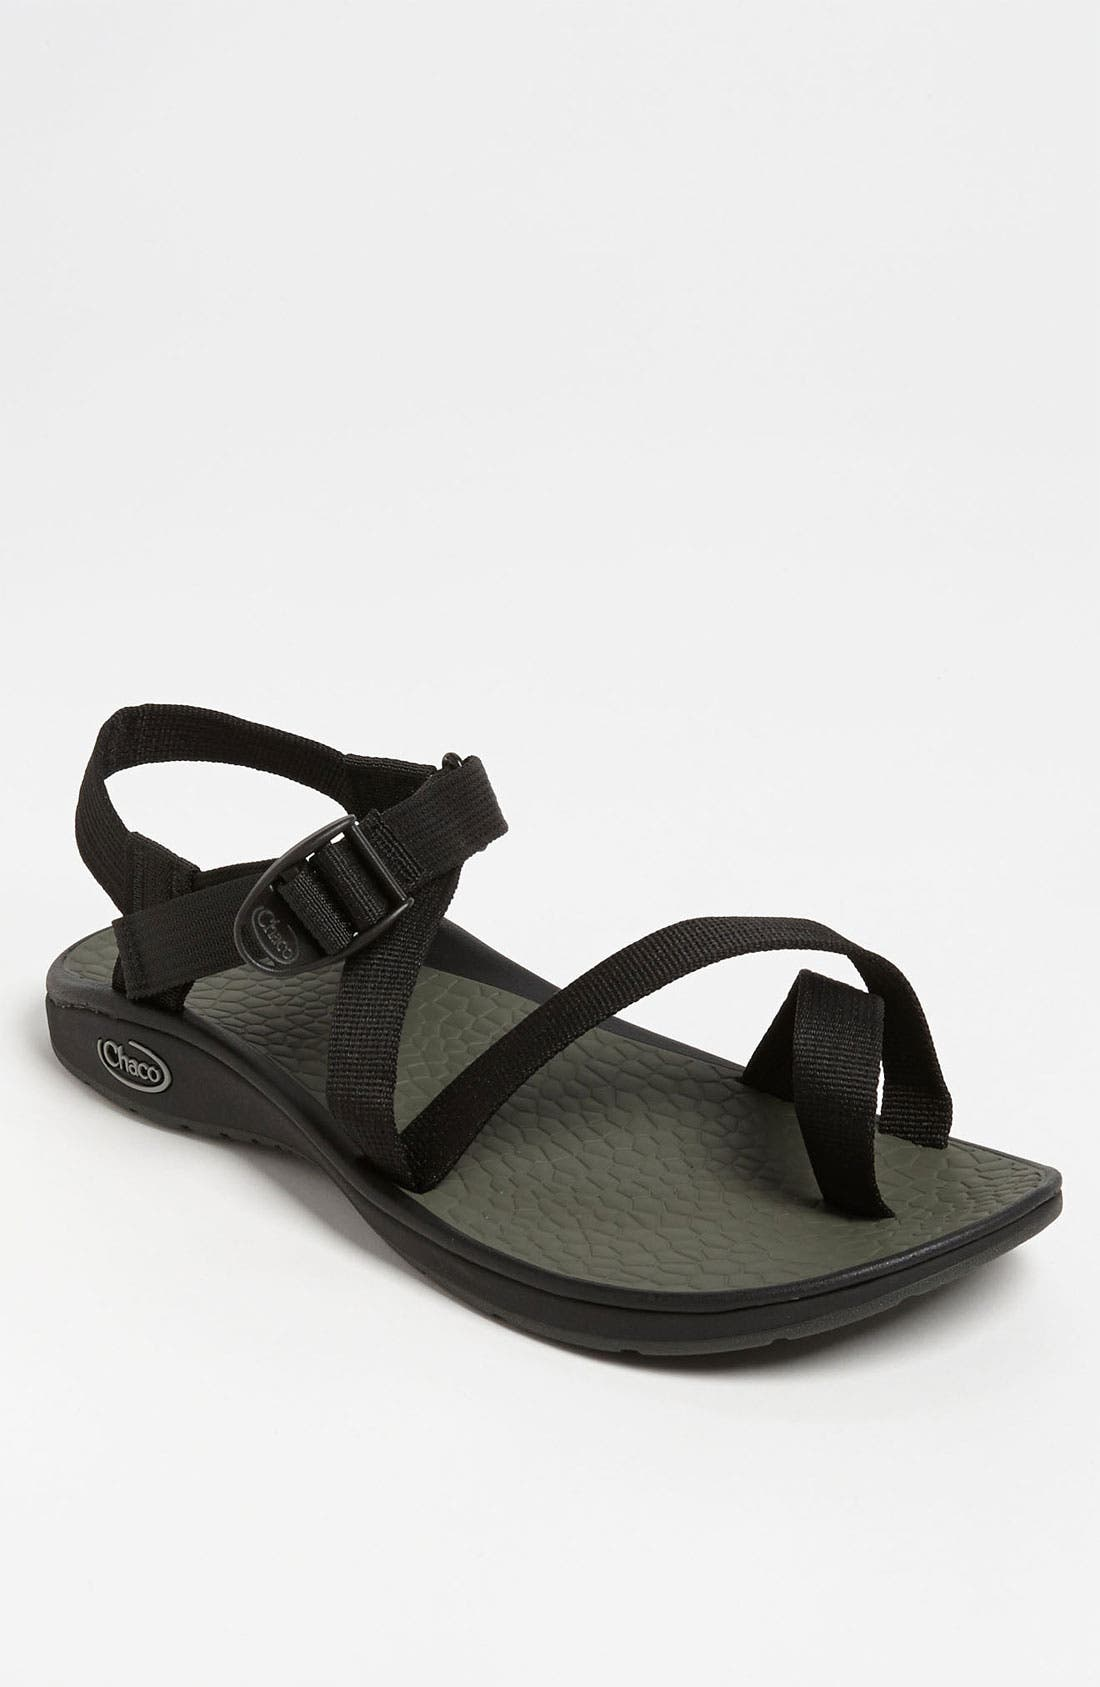 Main Image - Chaco 'Rex' Sandal (Men)